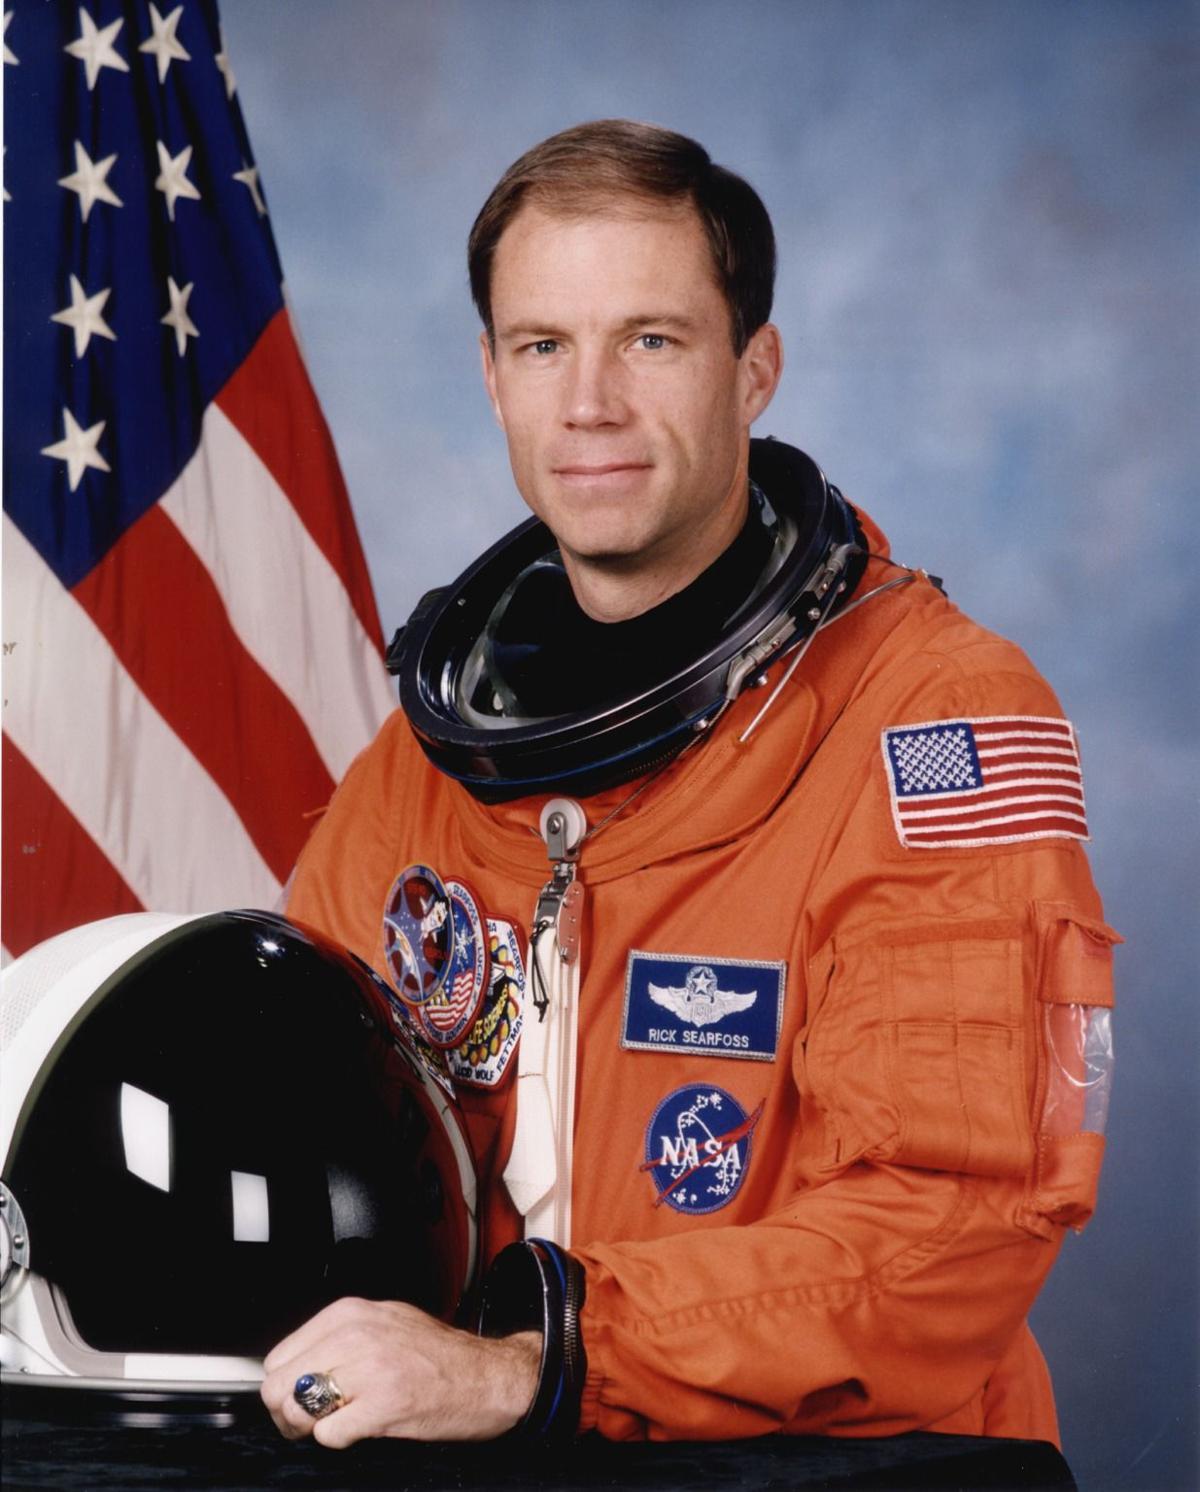 Richard Alan Searfoss, 1956–2018